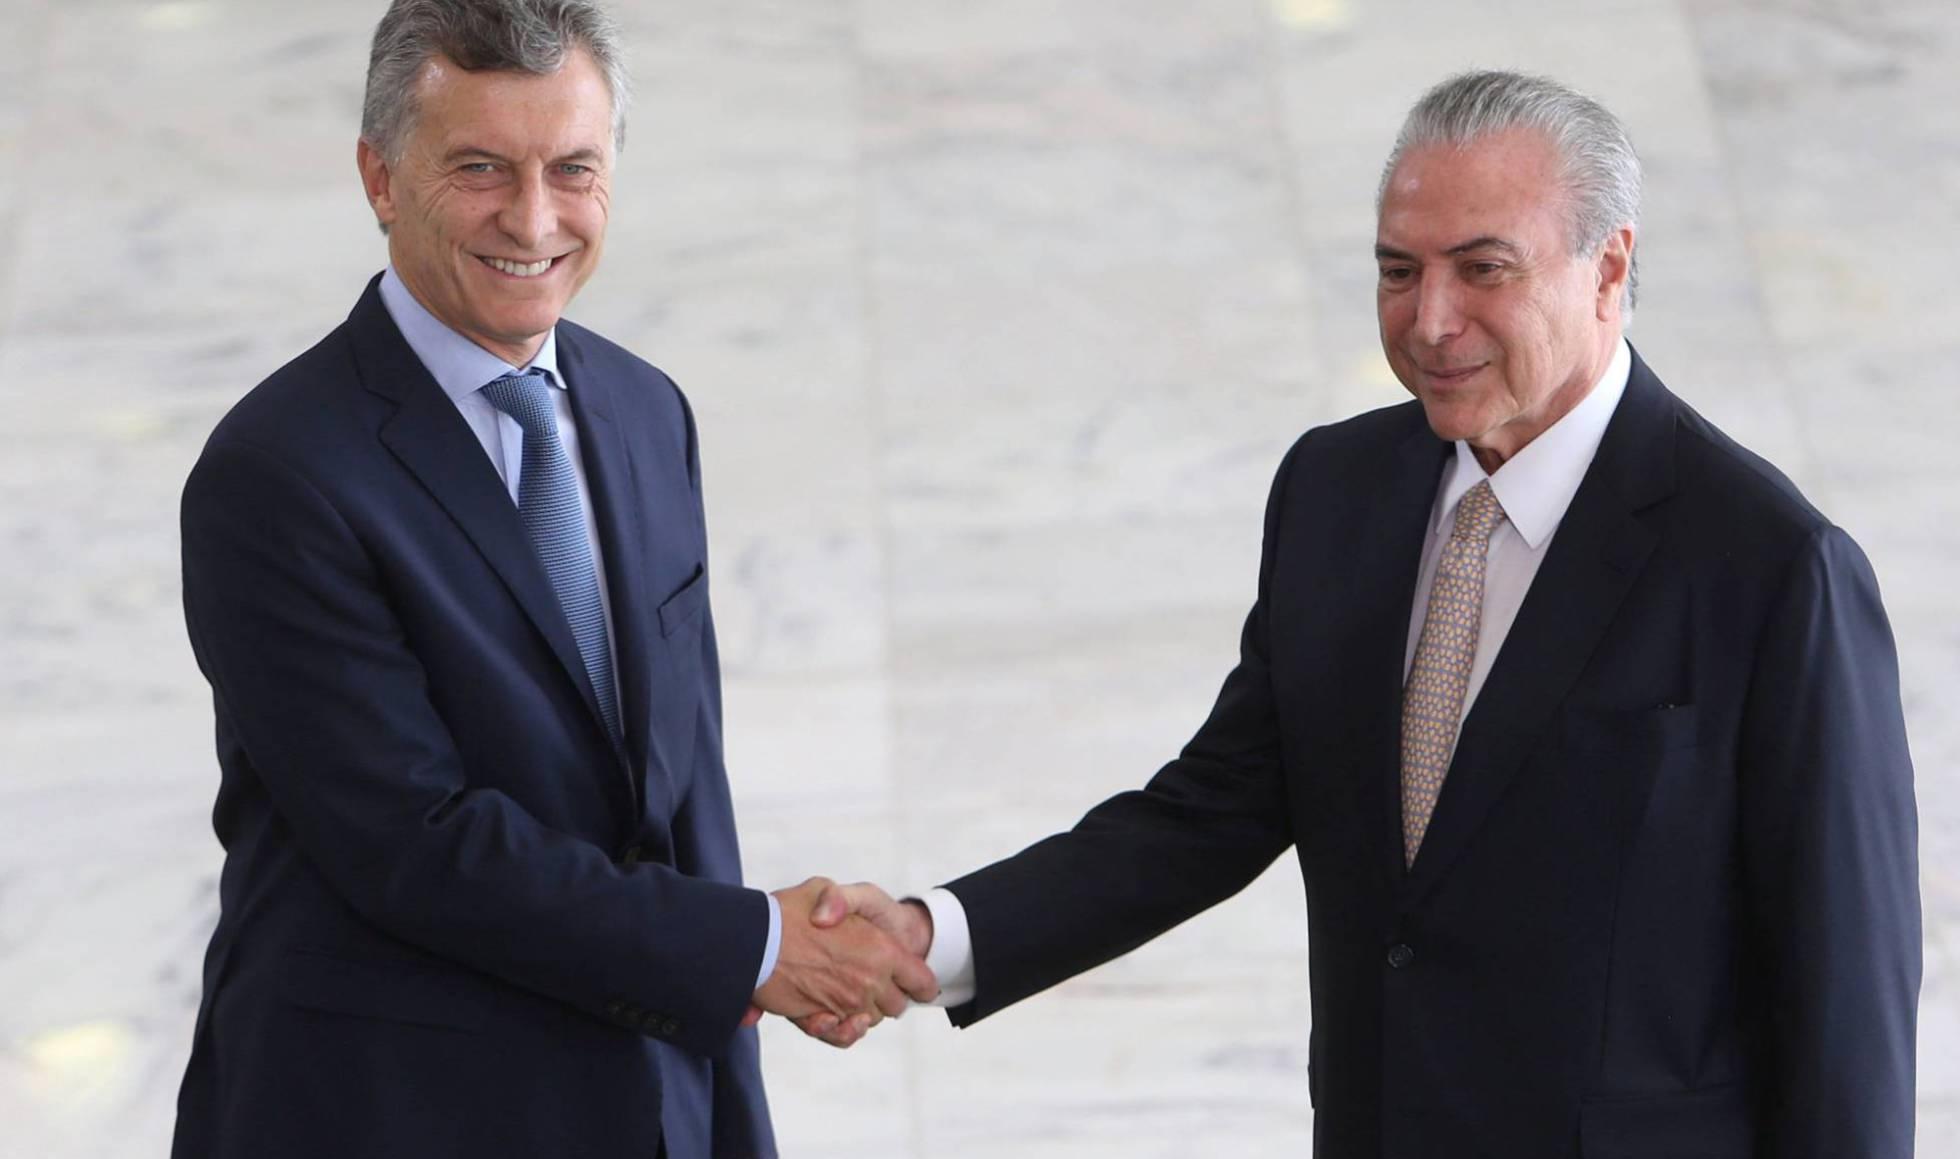 Argentina treme diante da crise brasileira